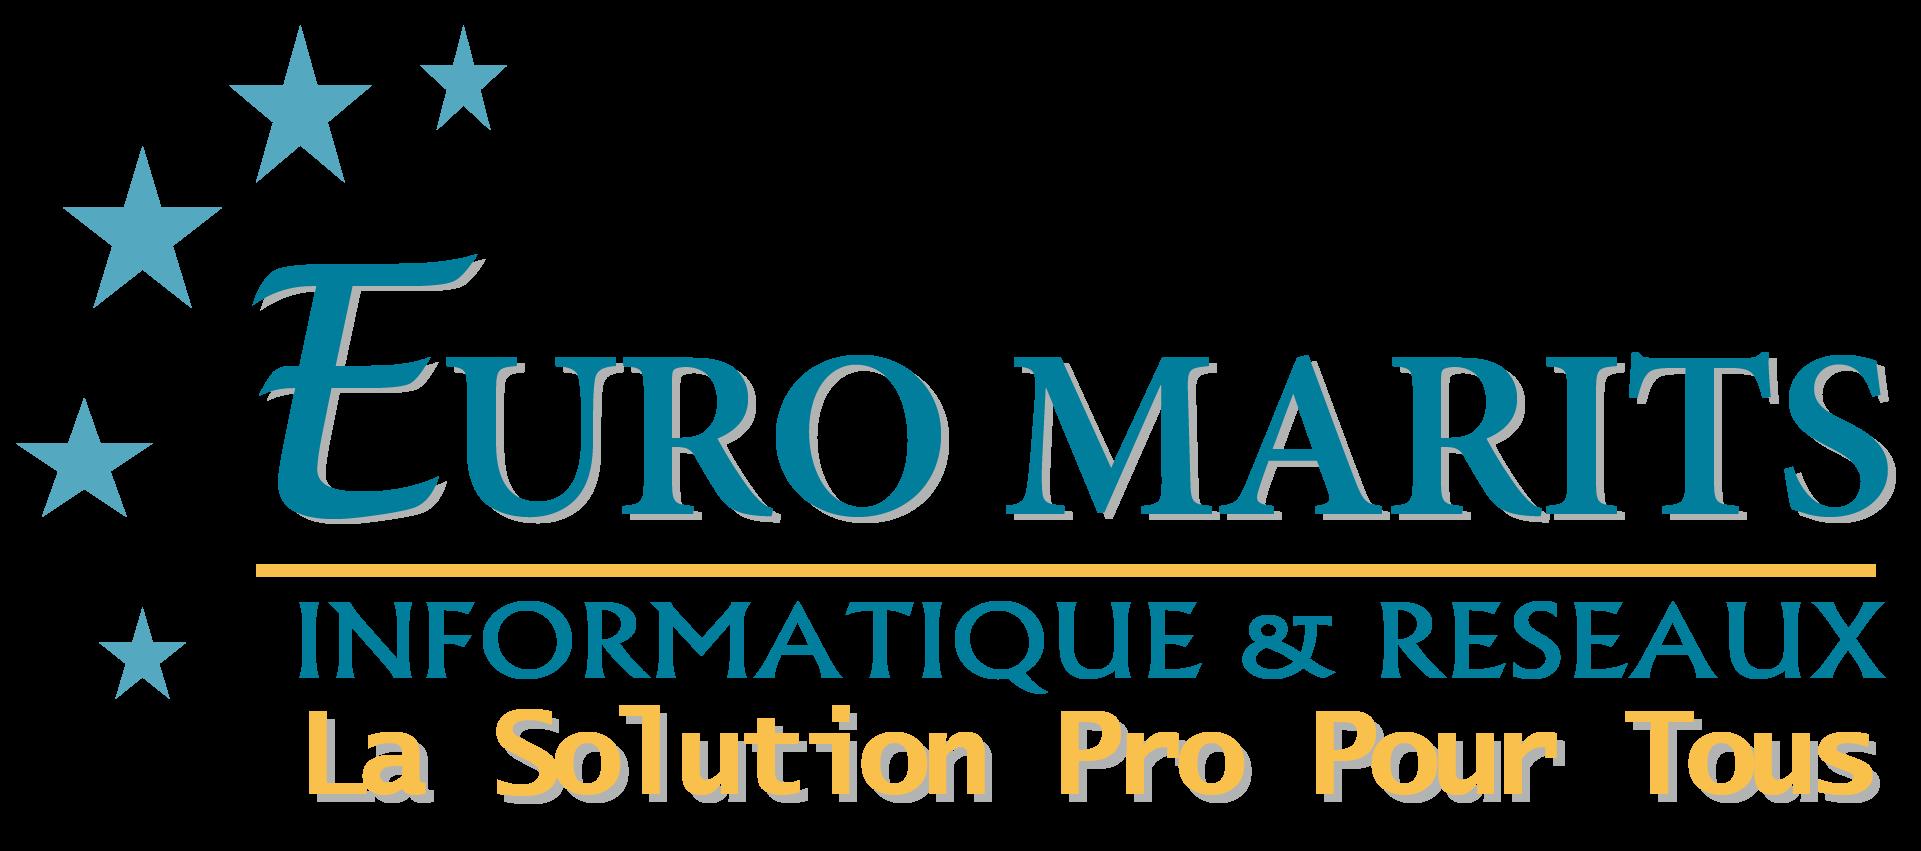 Euro Marits Informatique & Reseaux